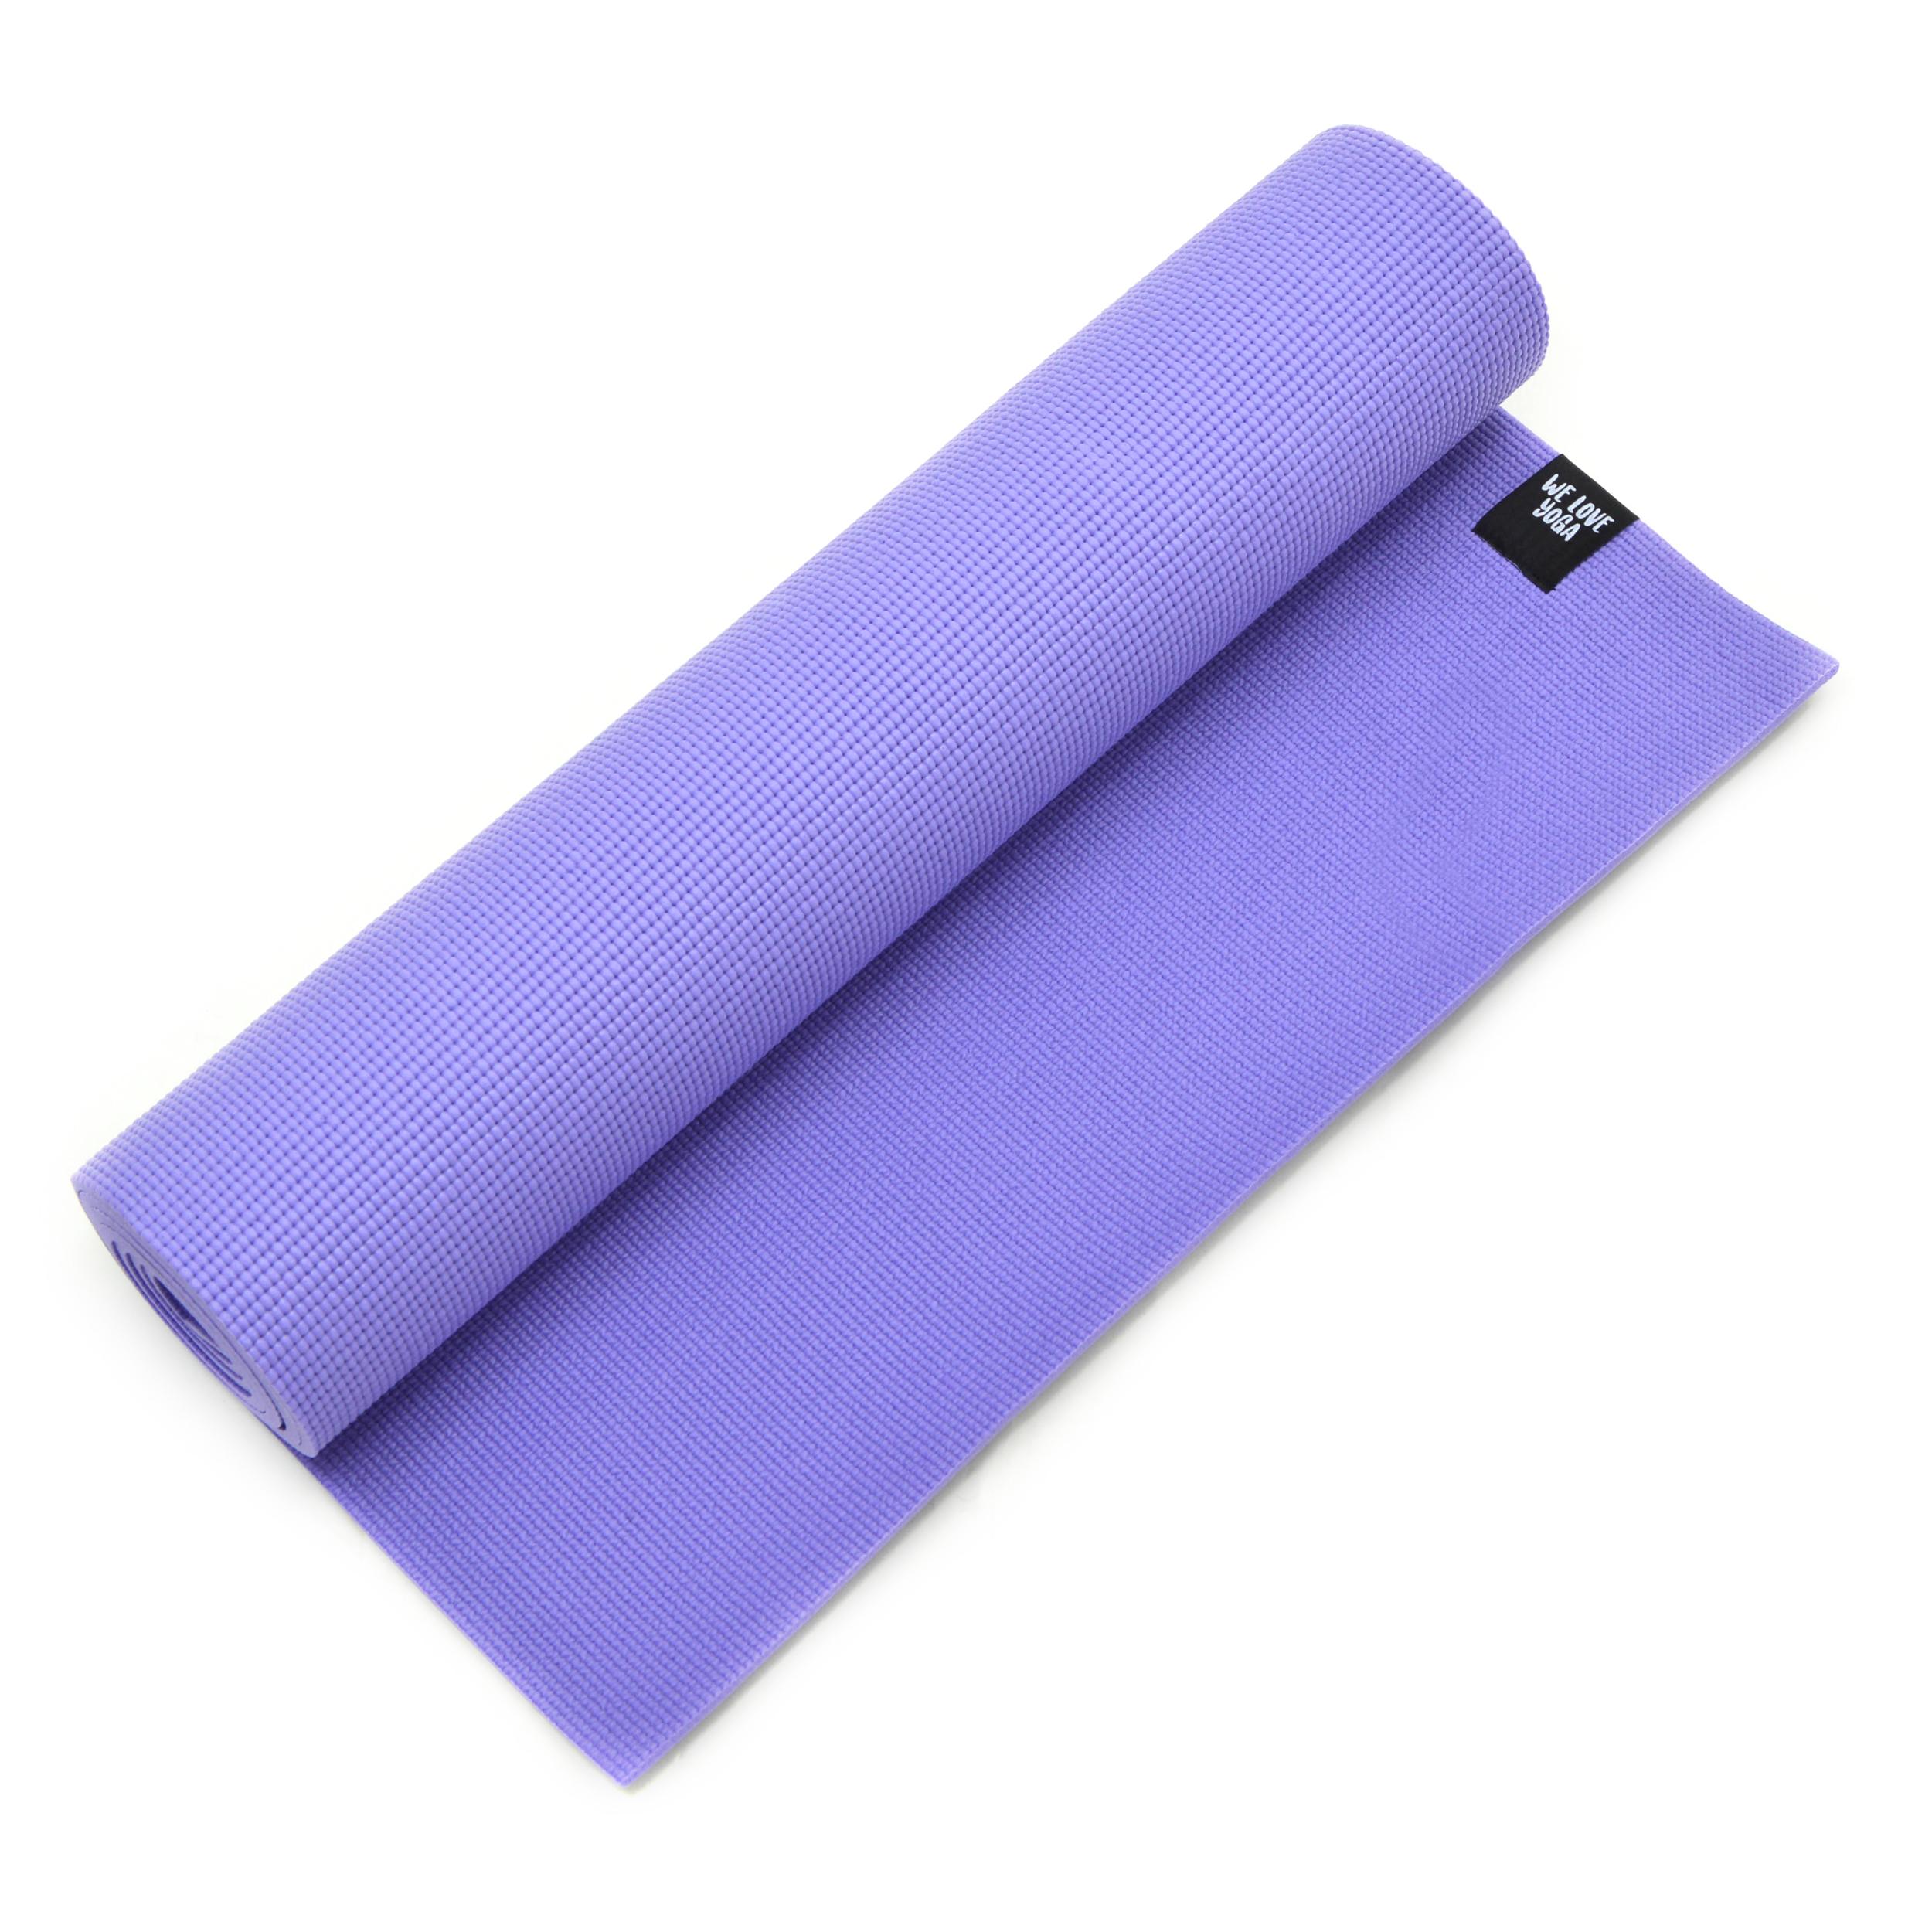 Zen Power PVC Yogamatte, für Yoga, Pilates, Gymnastik, Farbe: lila